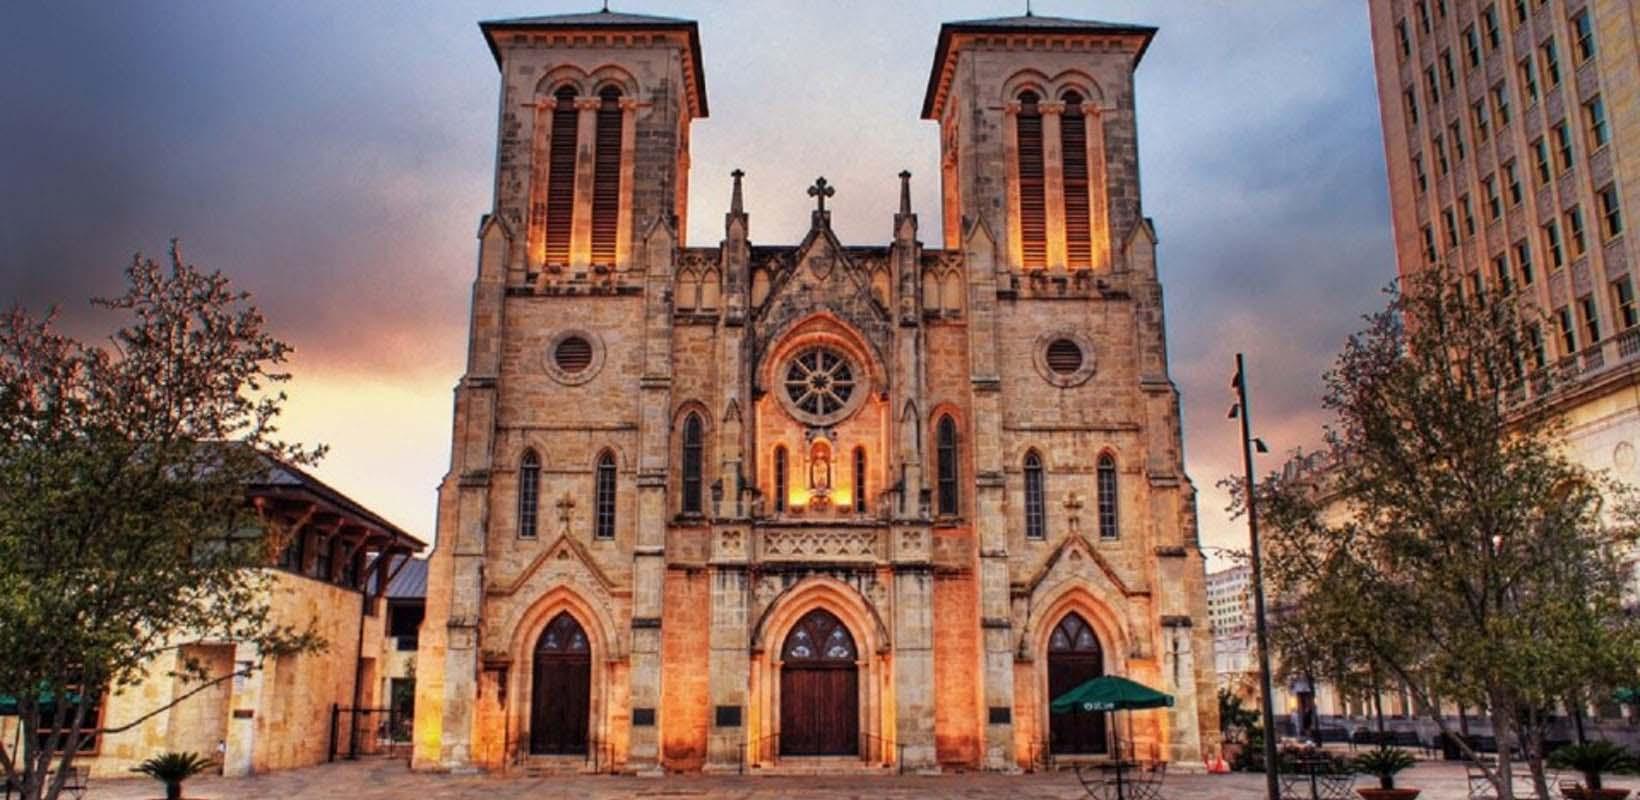 San Antonio: The Grand Historic City Tour (full day)